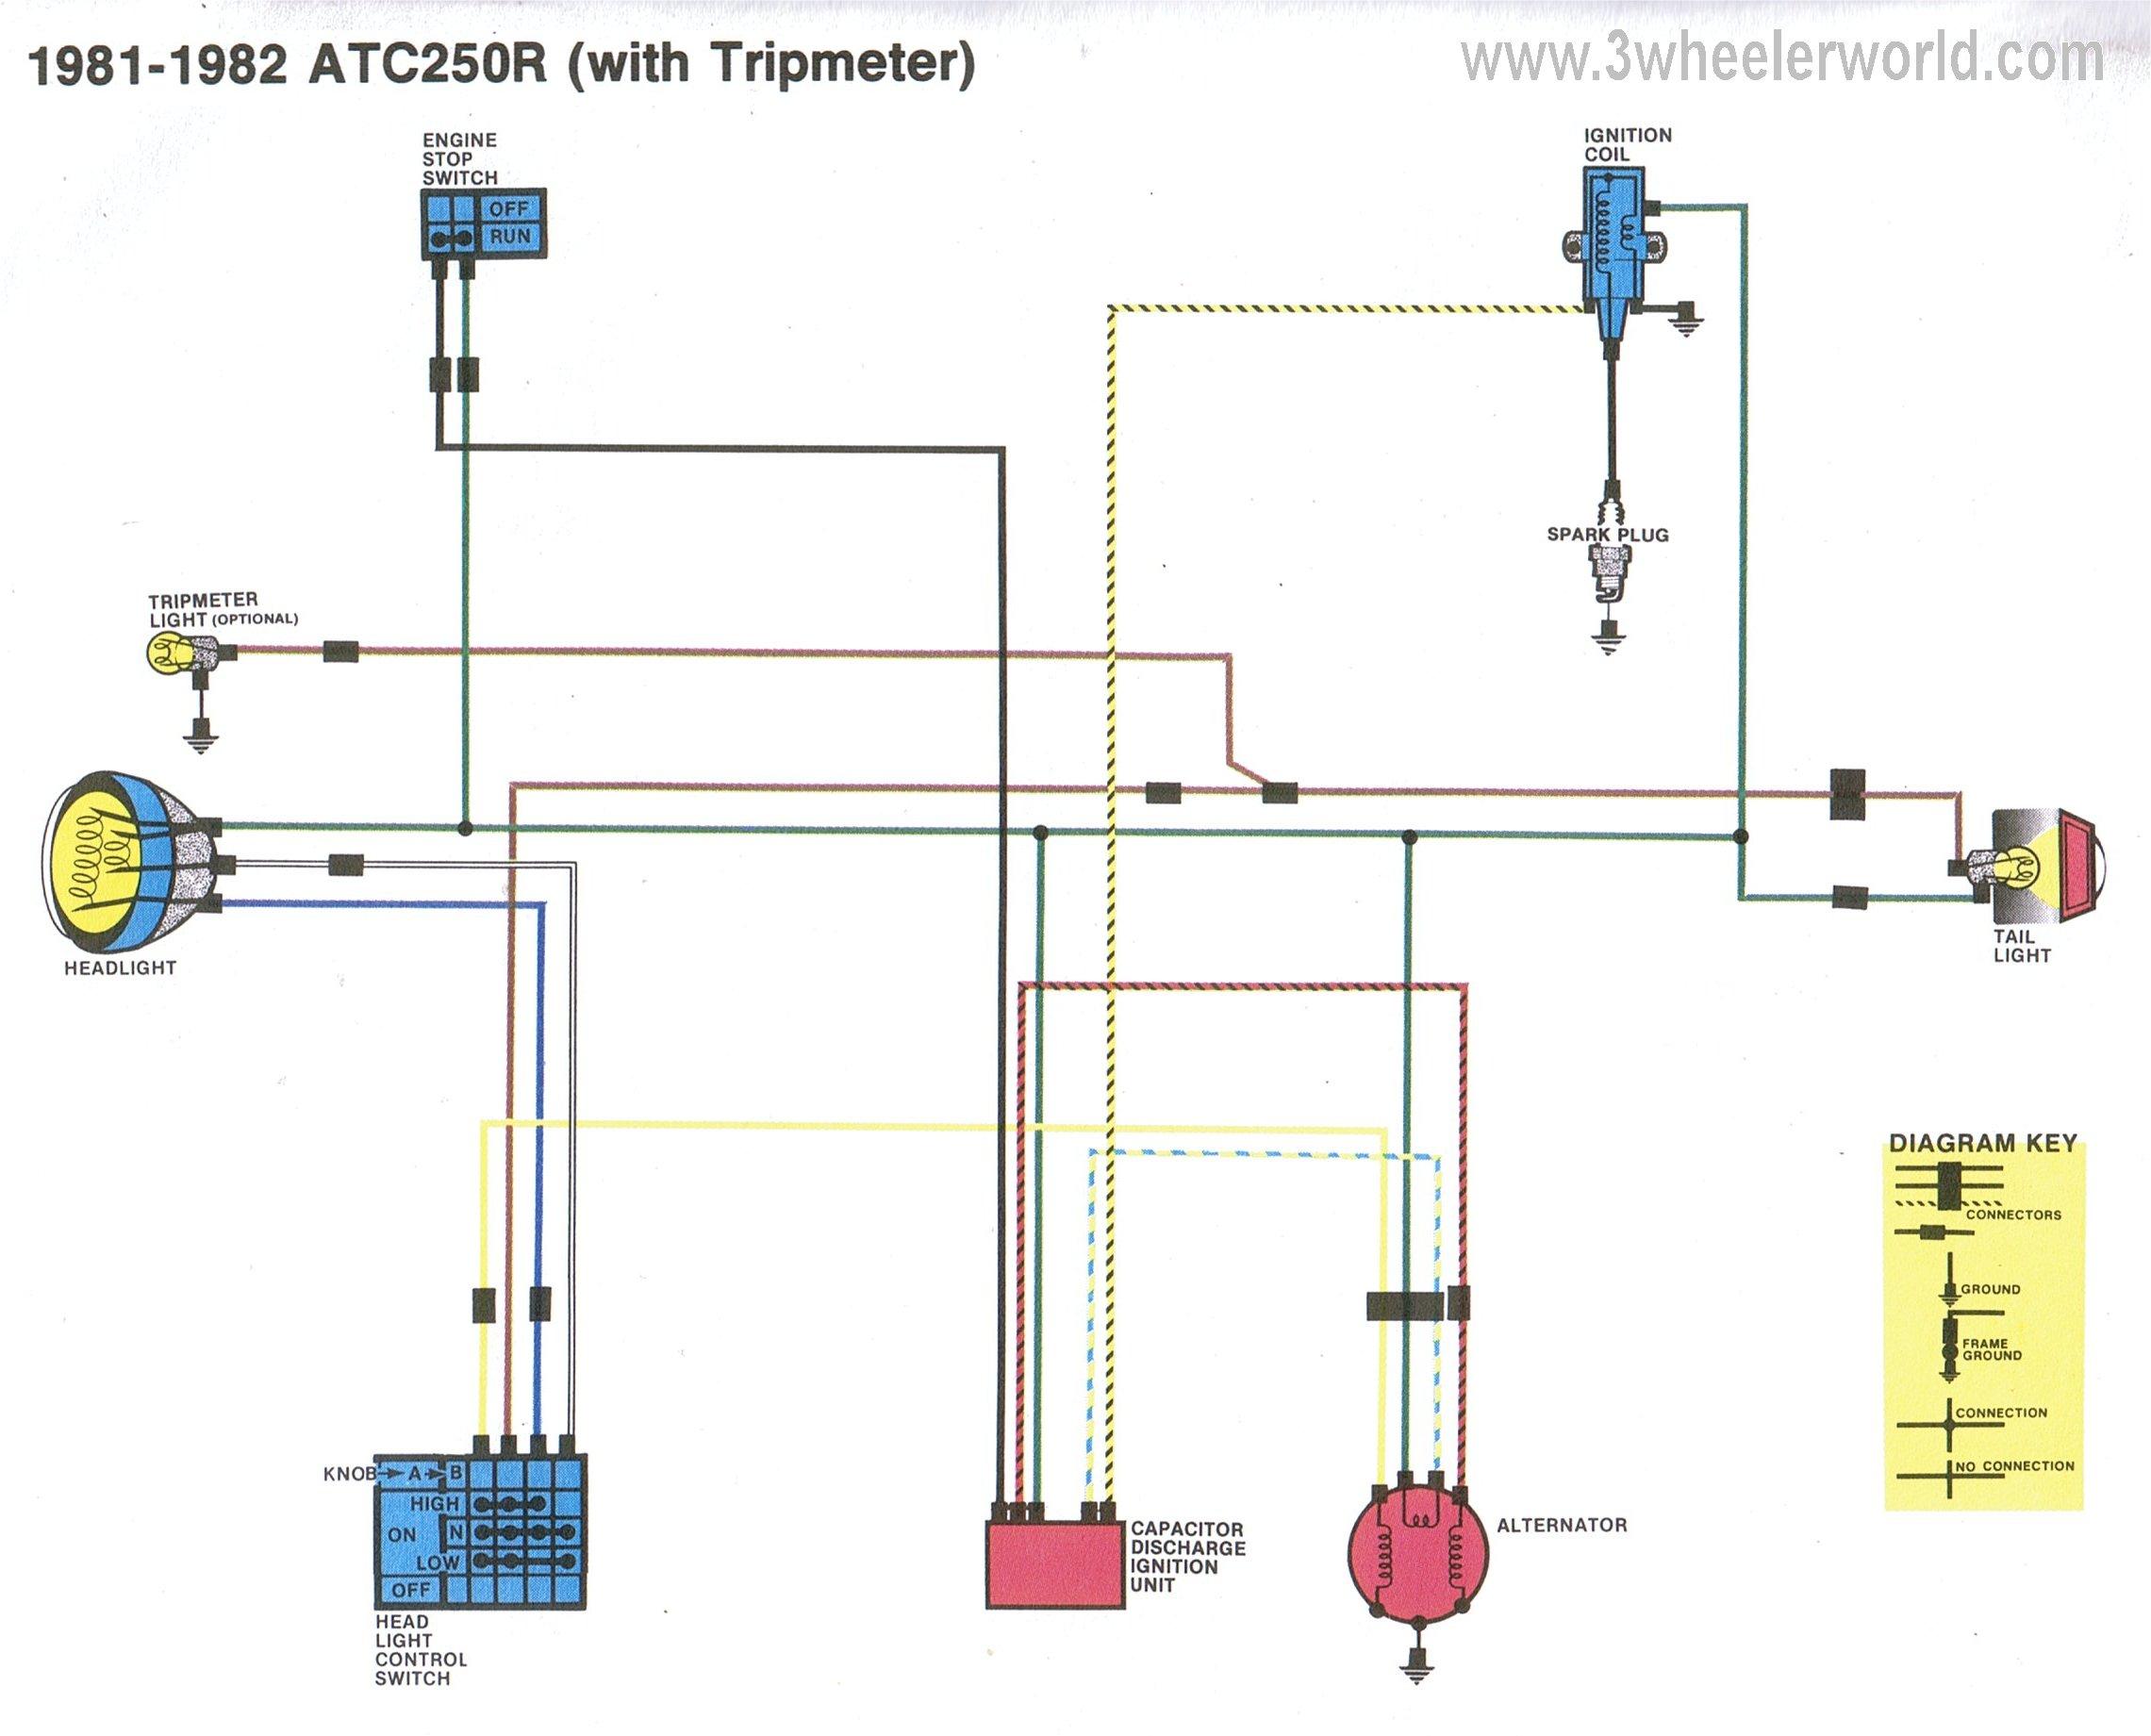 300ex Wiring Diagram 3 Wheeler World Tech Help Honda Wiring Diagrams